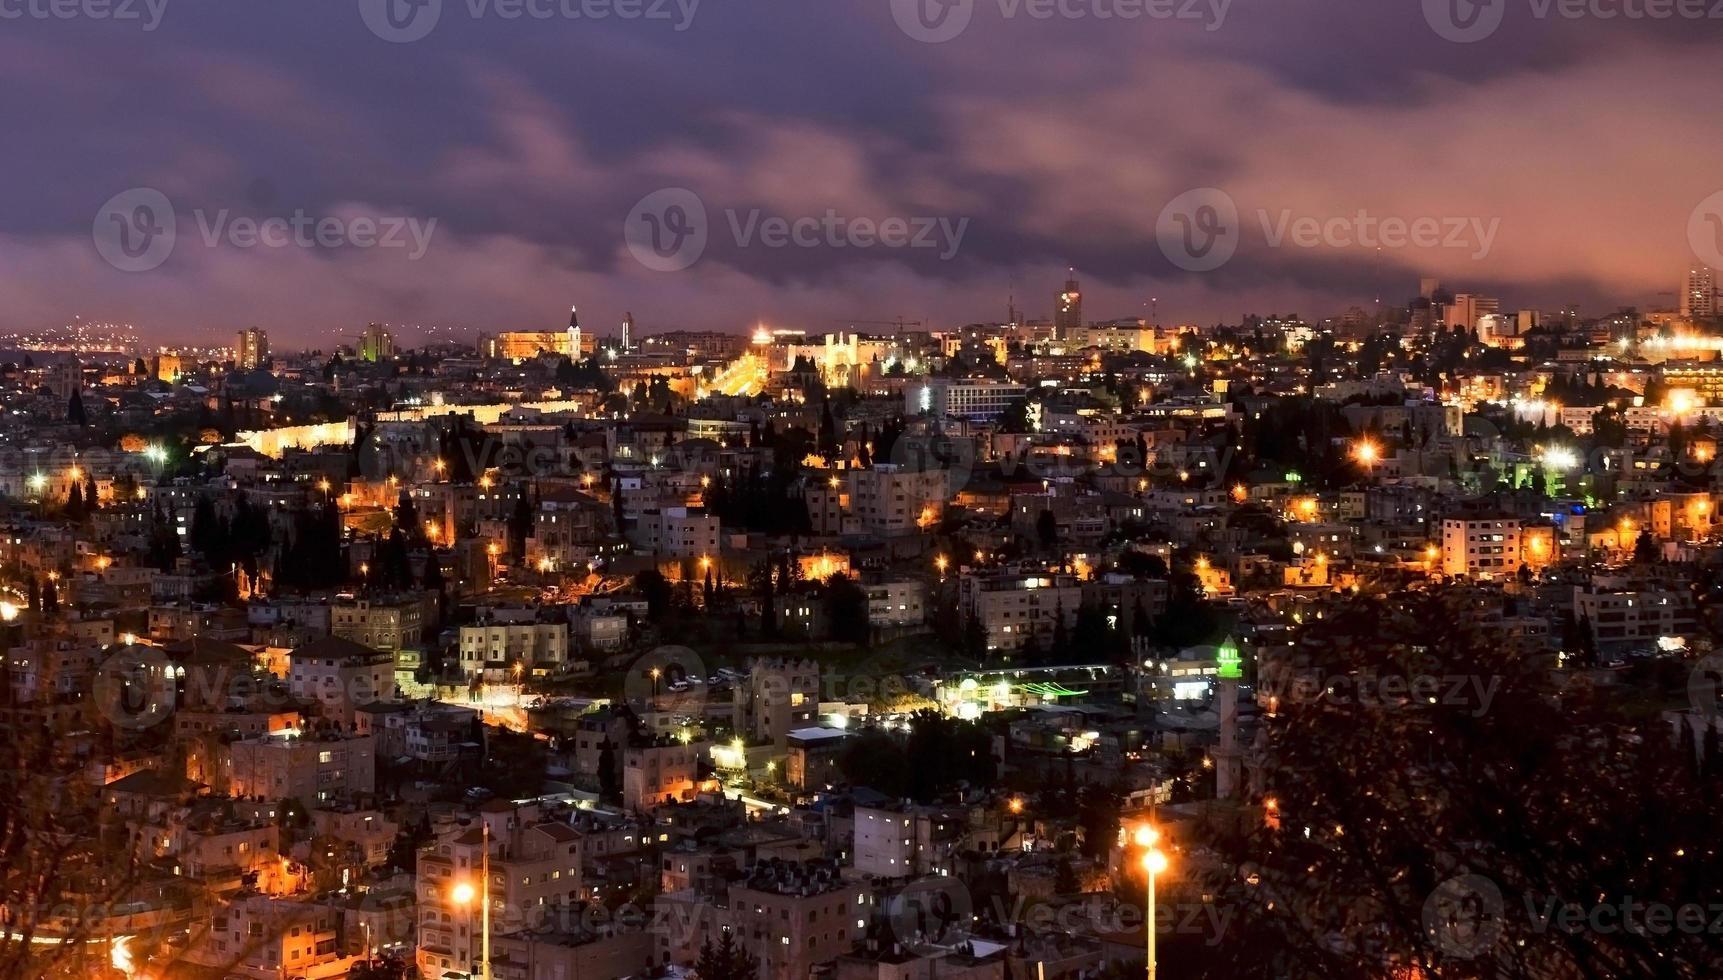 Jerusalem, Israel - night view photo